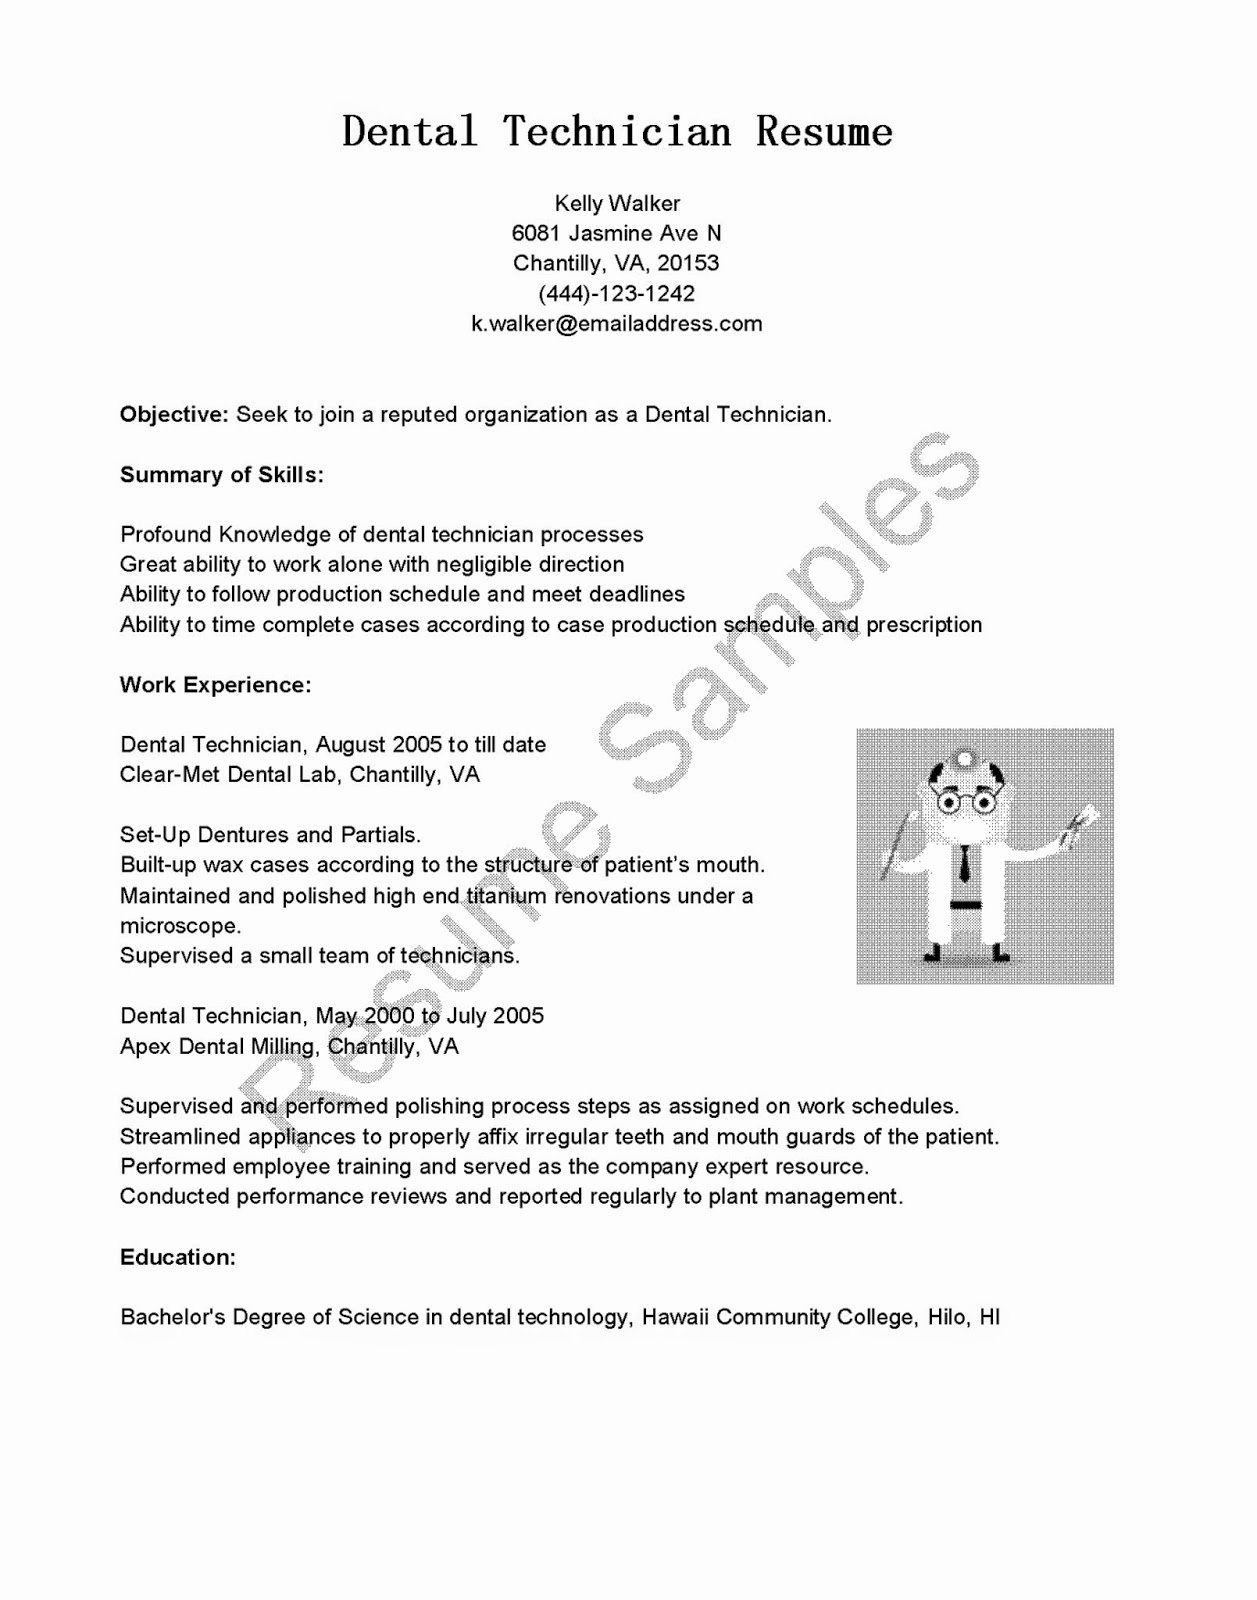 Resume Samples Dental Technician Resume Sample